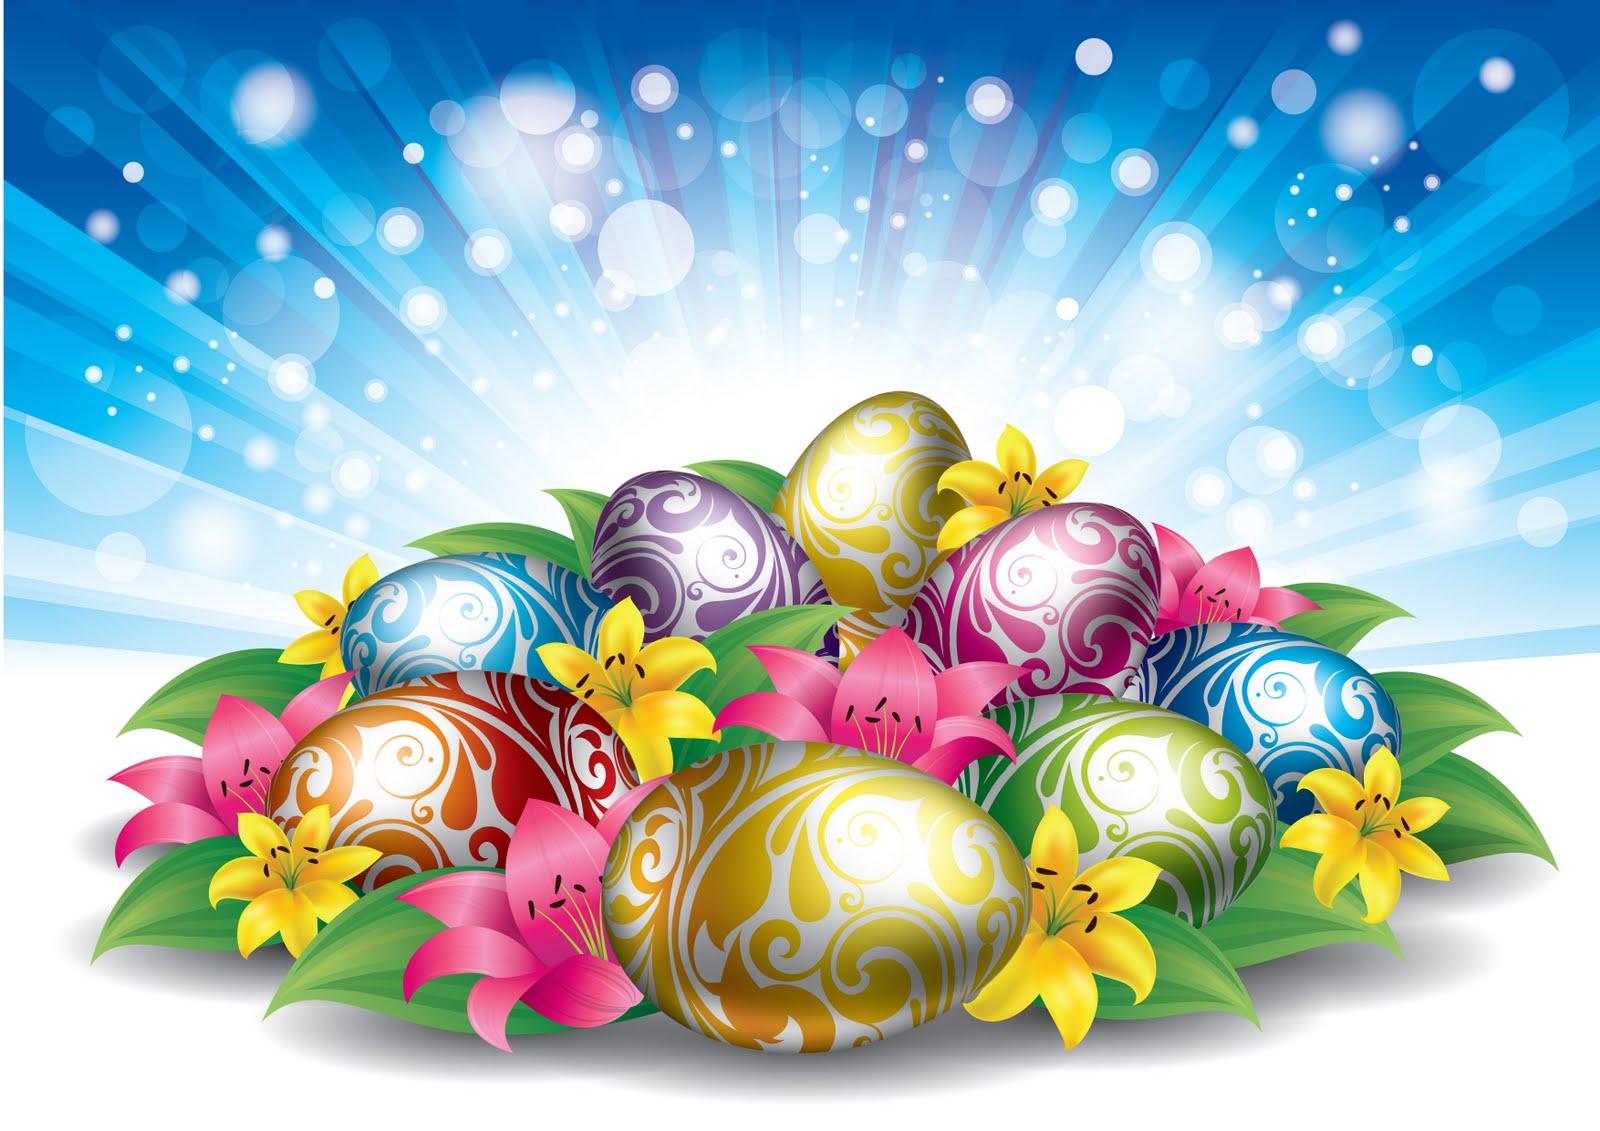 Free holiday wallpapers - Easter desktop wallpaper ...